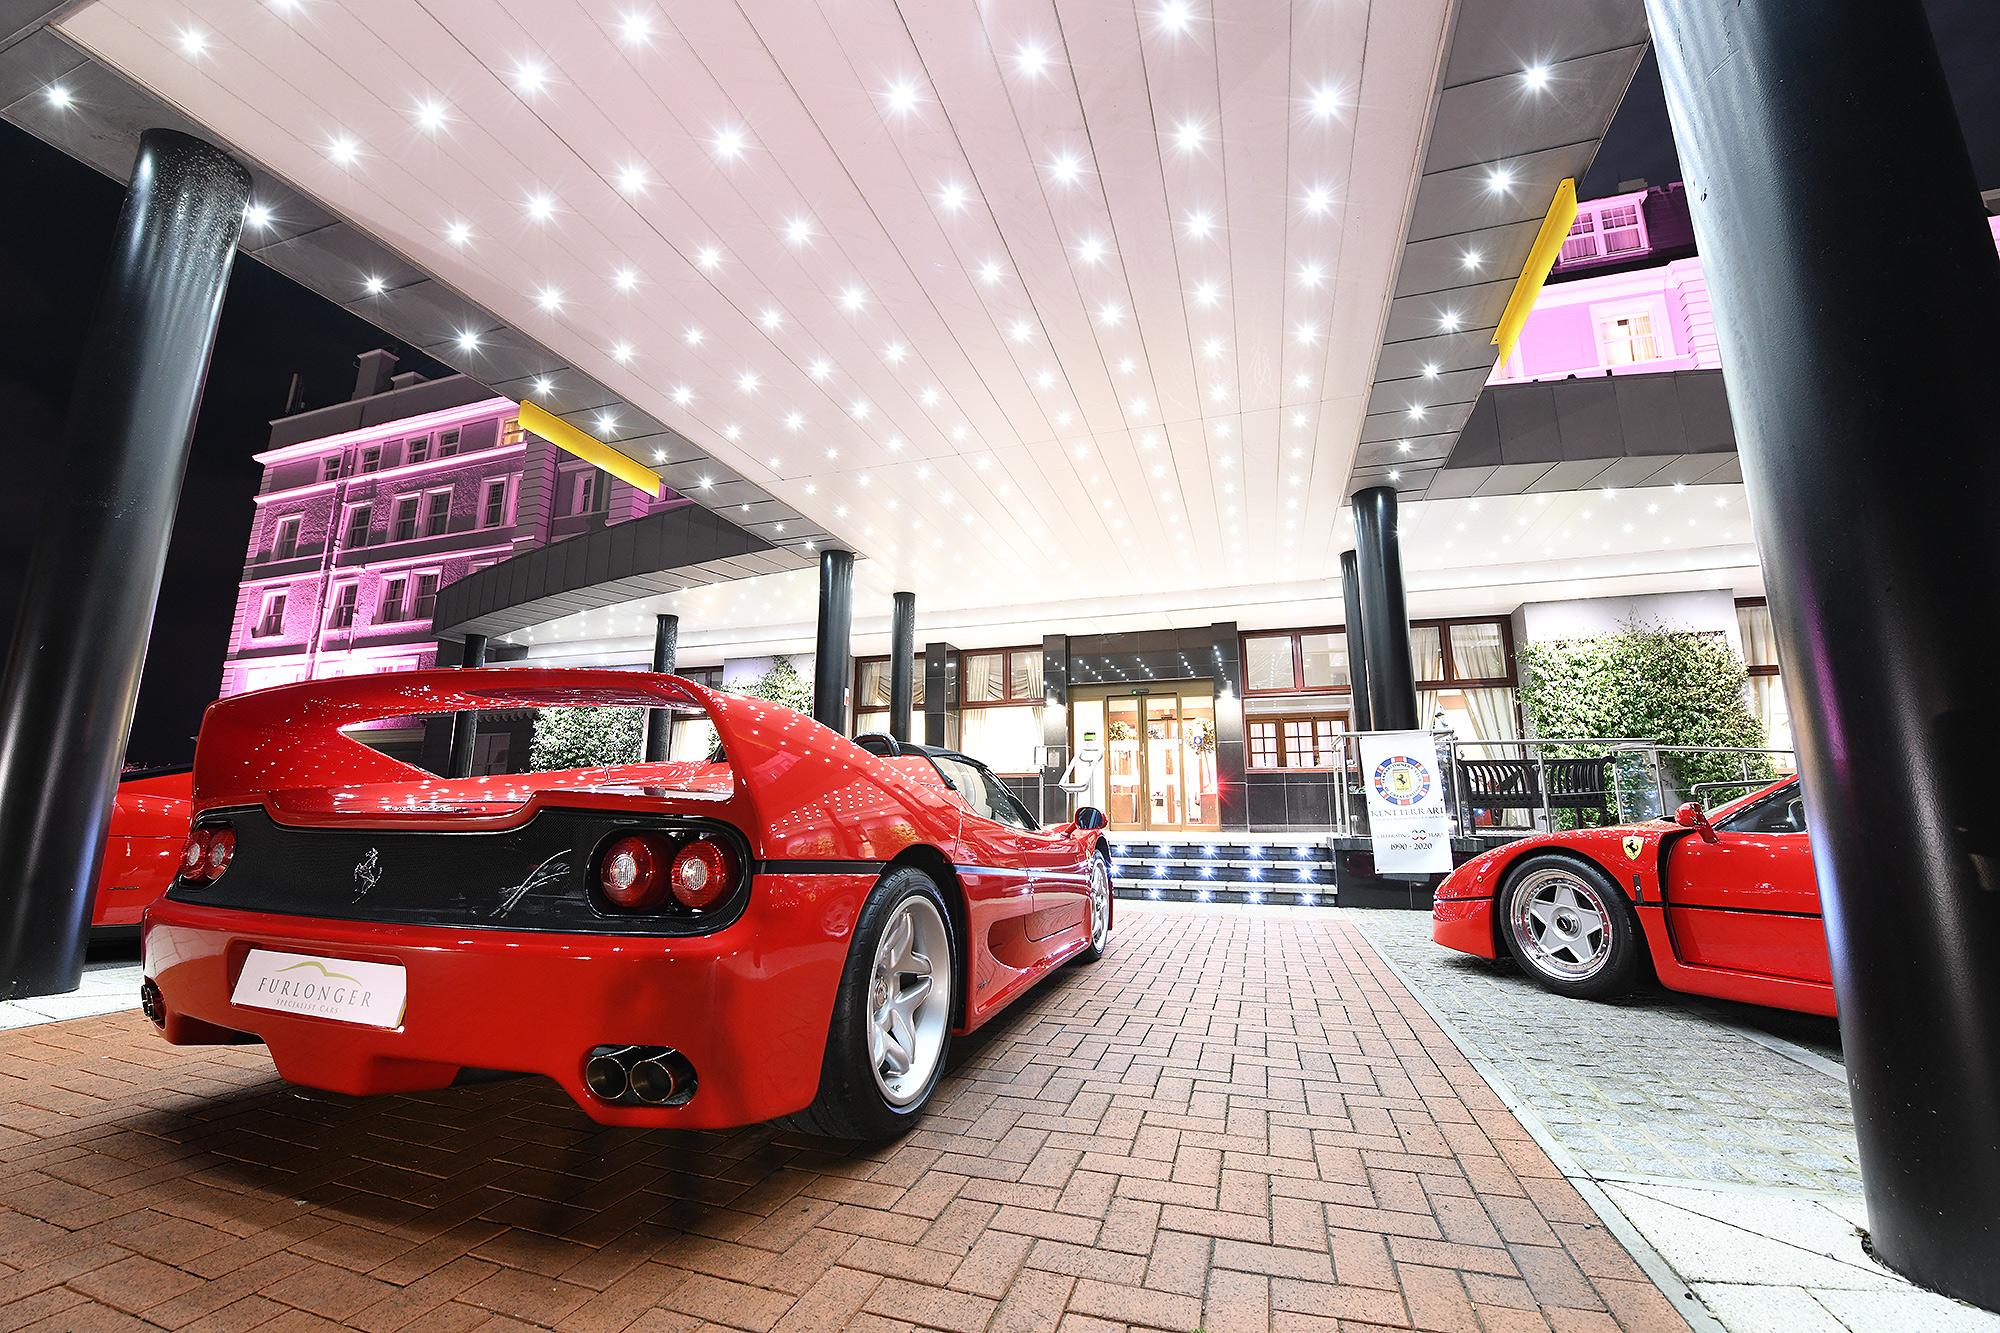 Traditional photographic image - Ferrari F50